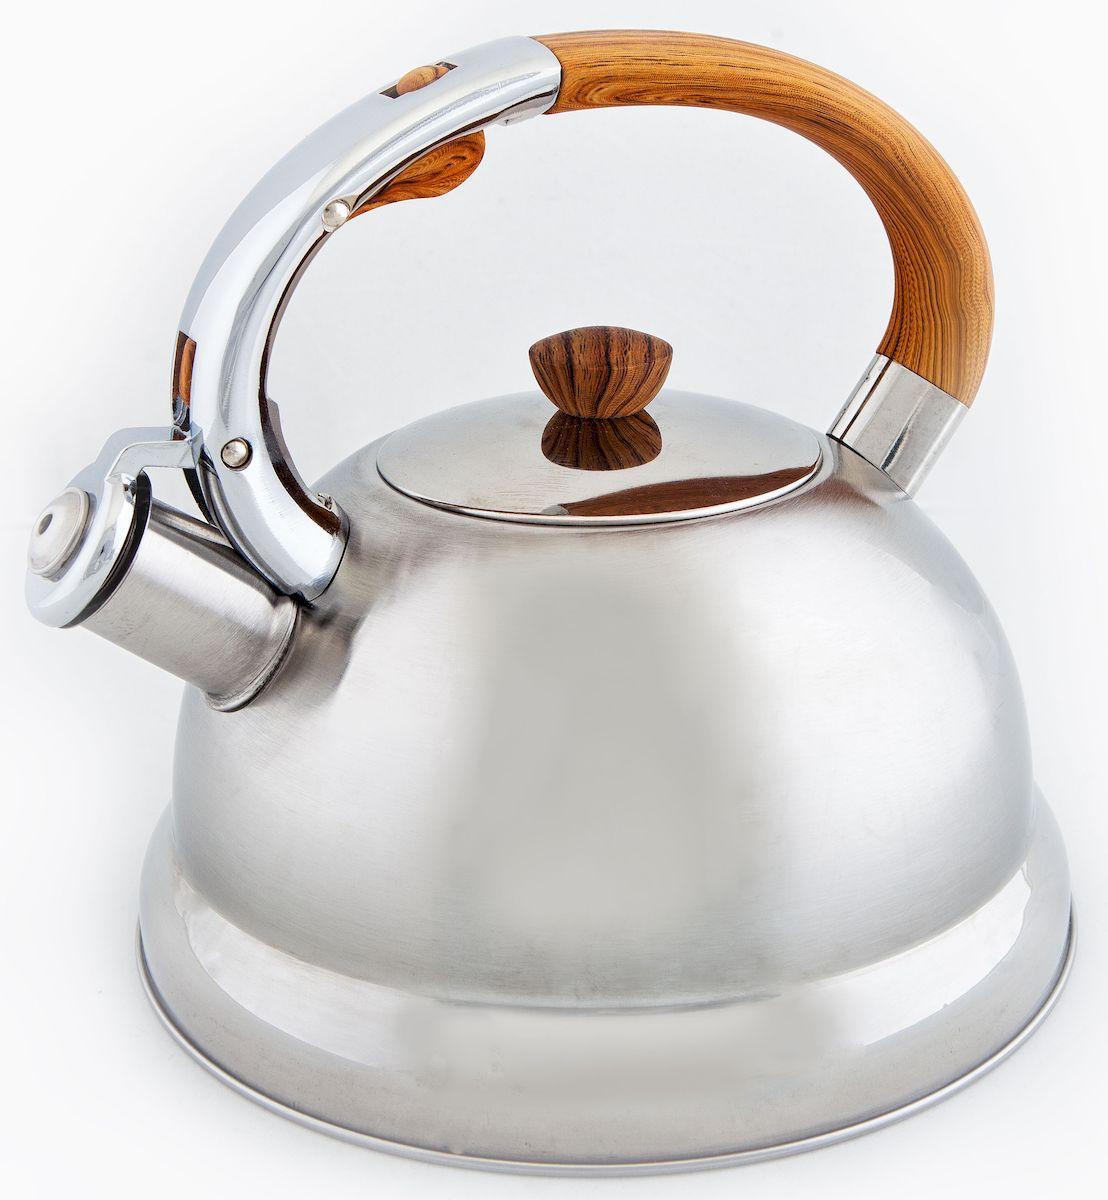 Чайник Hoffmann, со свистком, 3 л. НМ 5516НМ 5516